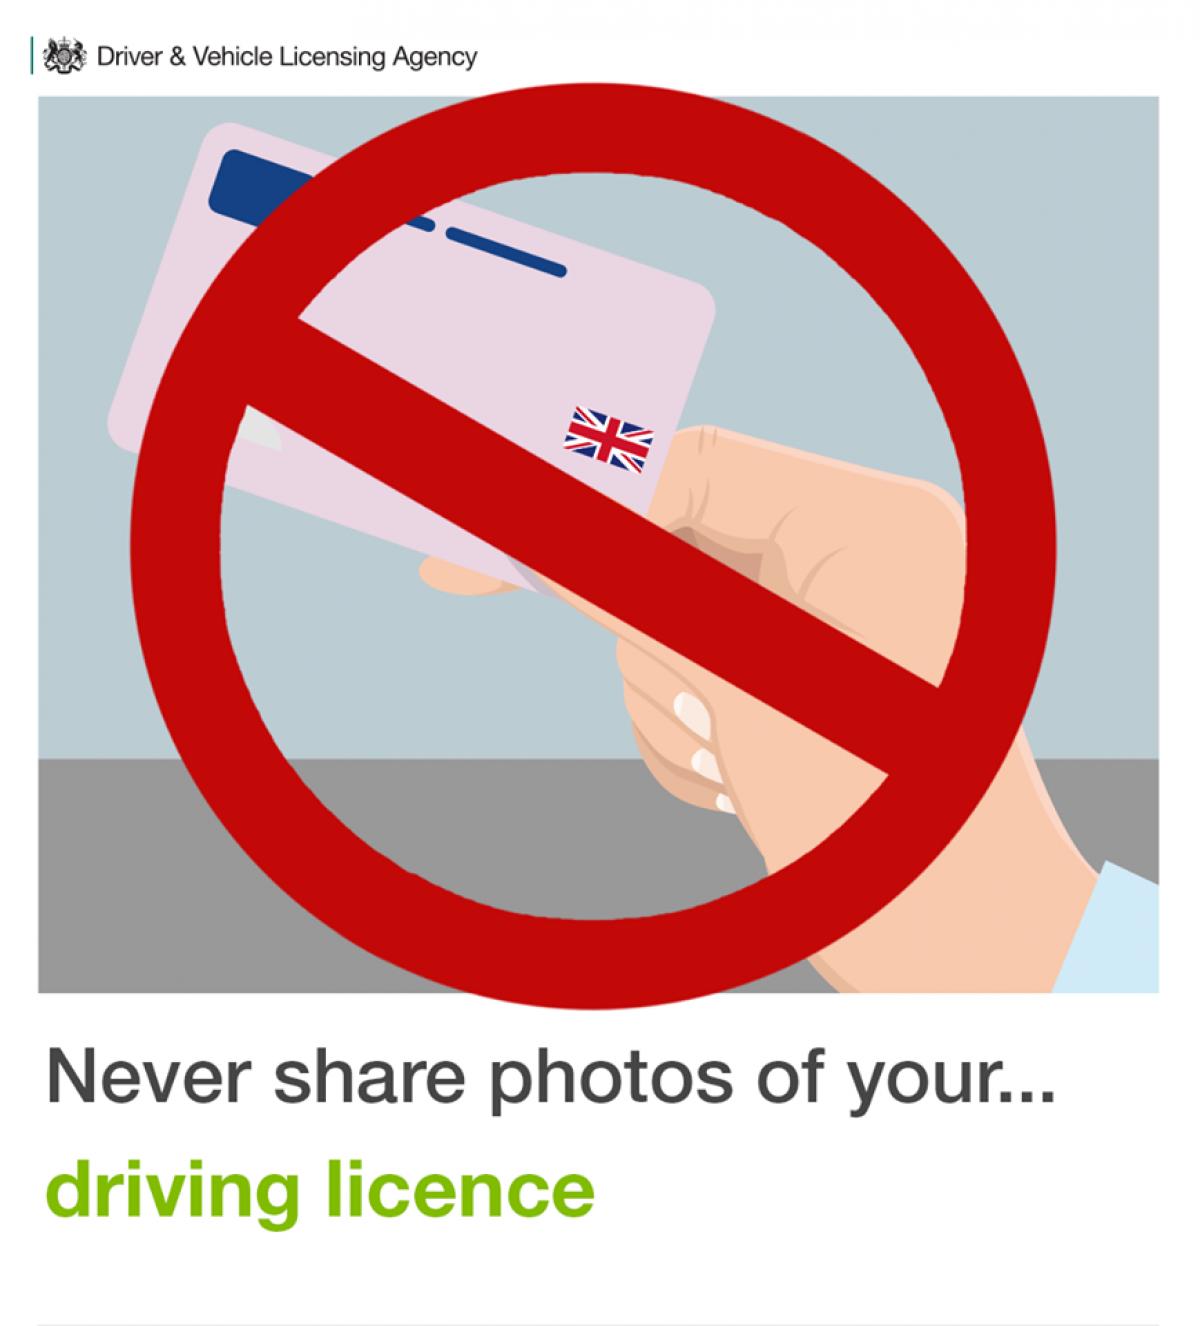 DVLA Warnings to Motorists in 2019 Image 6